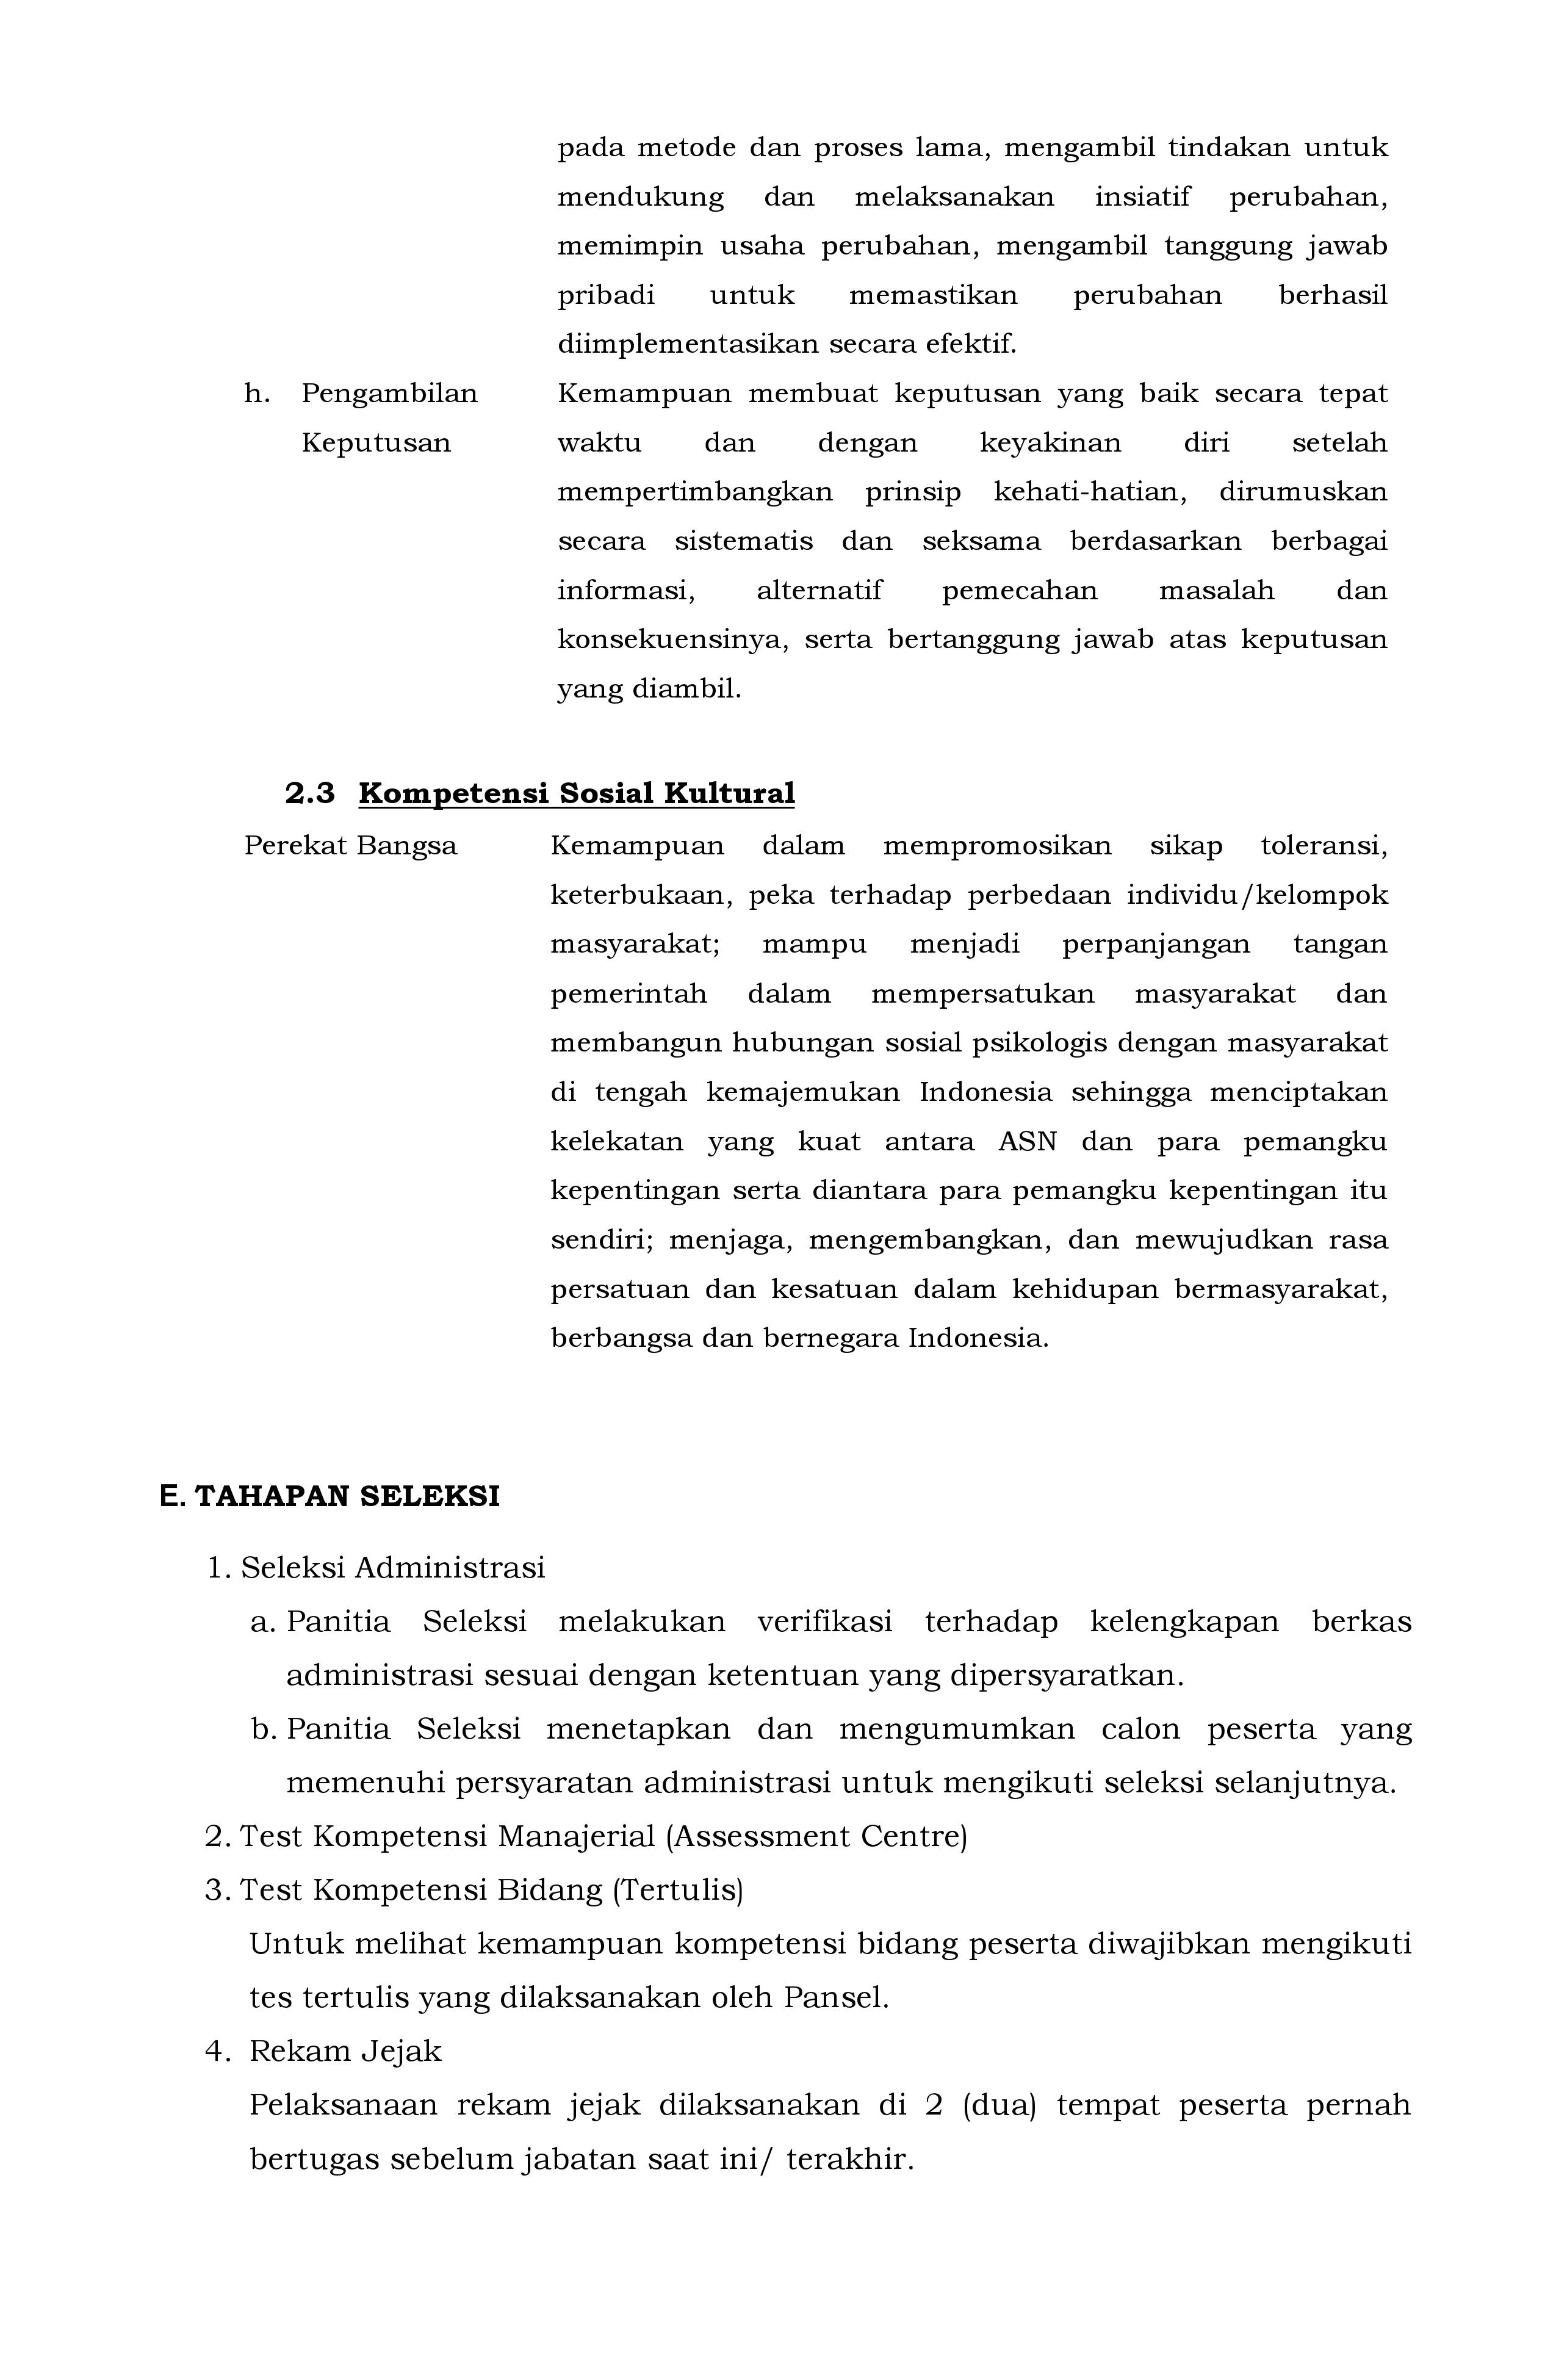 https://bkpsdm.lebongkab.go.id/an-component/media/upload-gambar-pendukung/JPT/0005.jpg